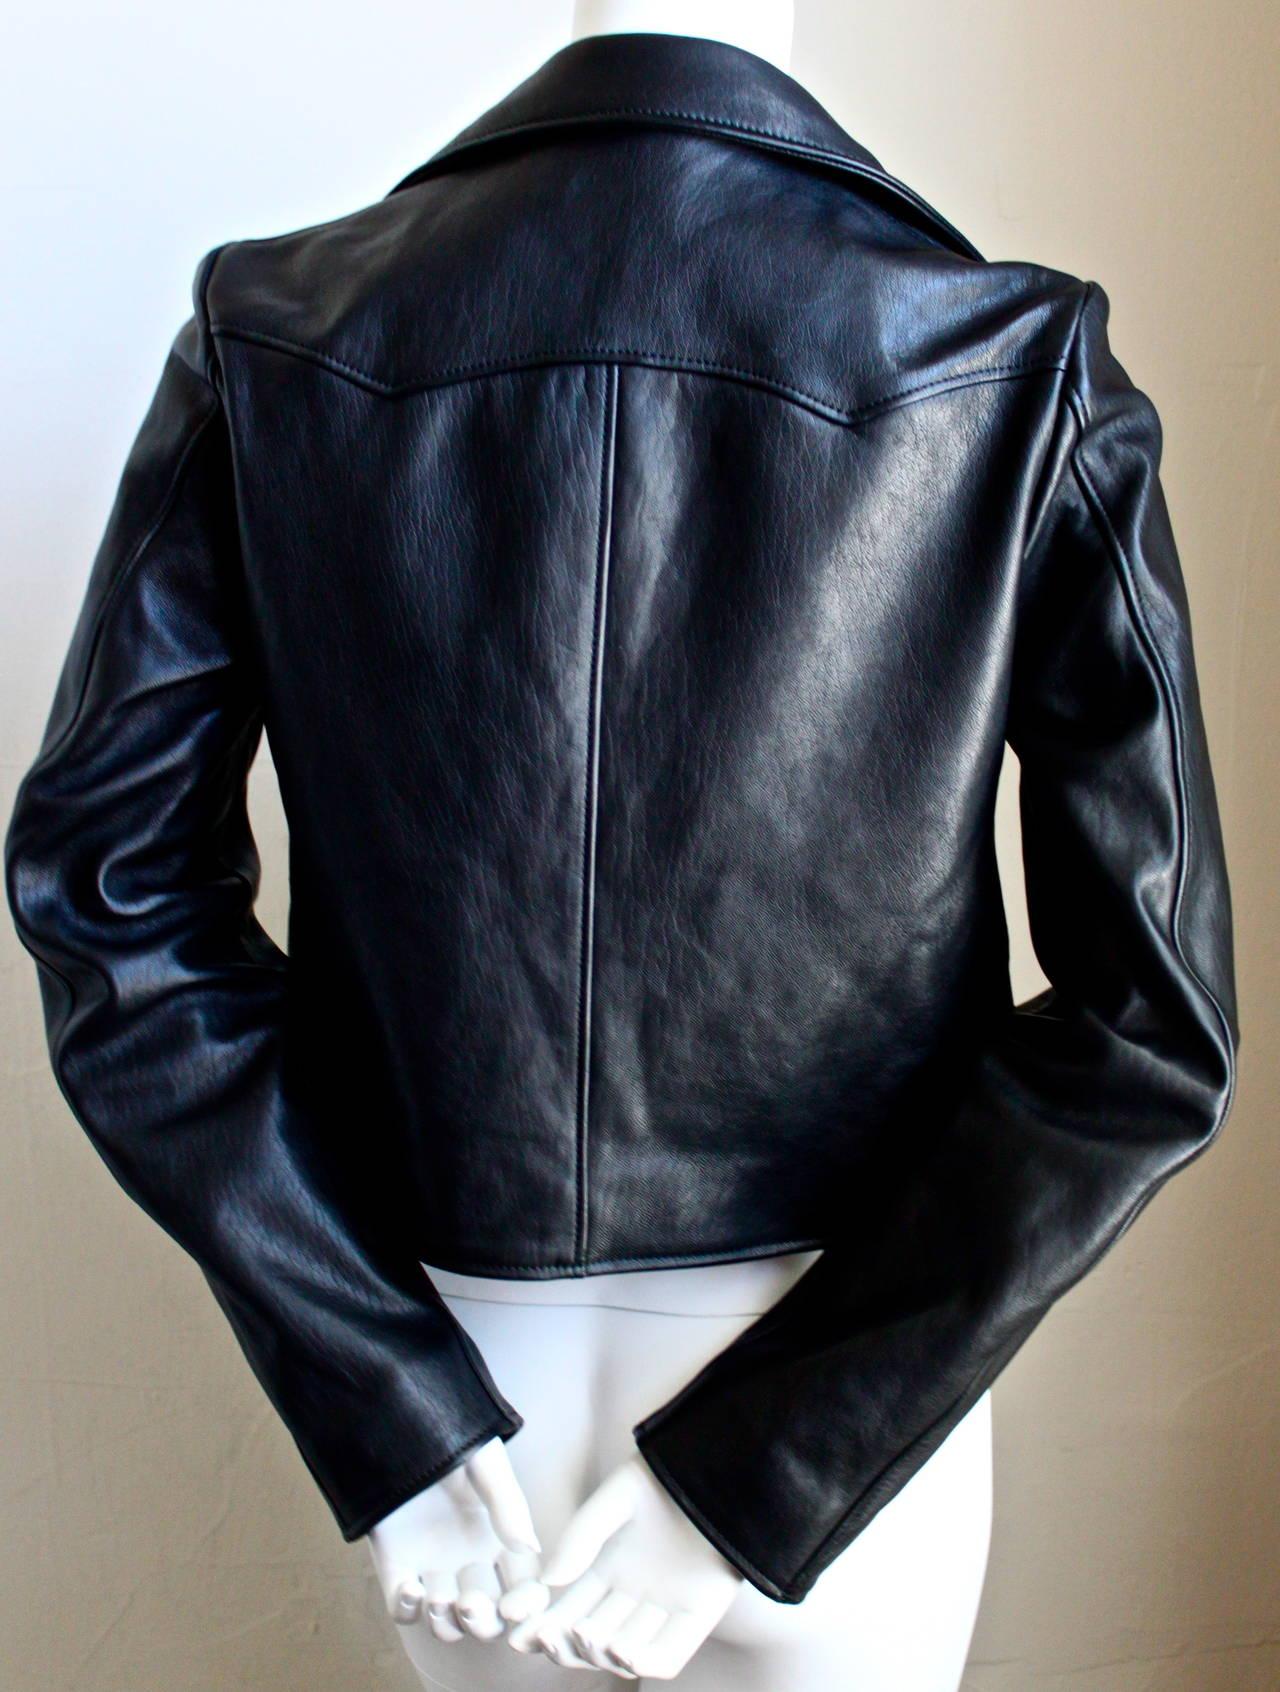 HEDI SLIMANE for SAINT LAURENT  black leather runway leather jacket - NEW 2